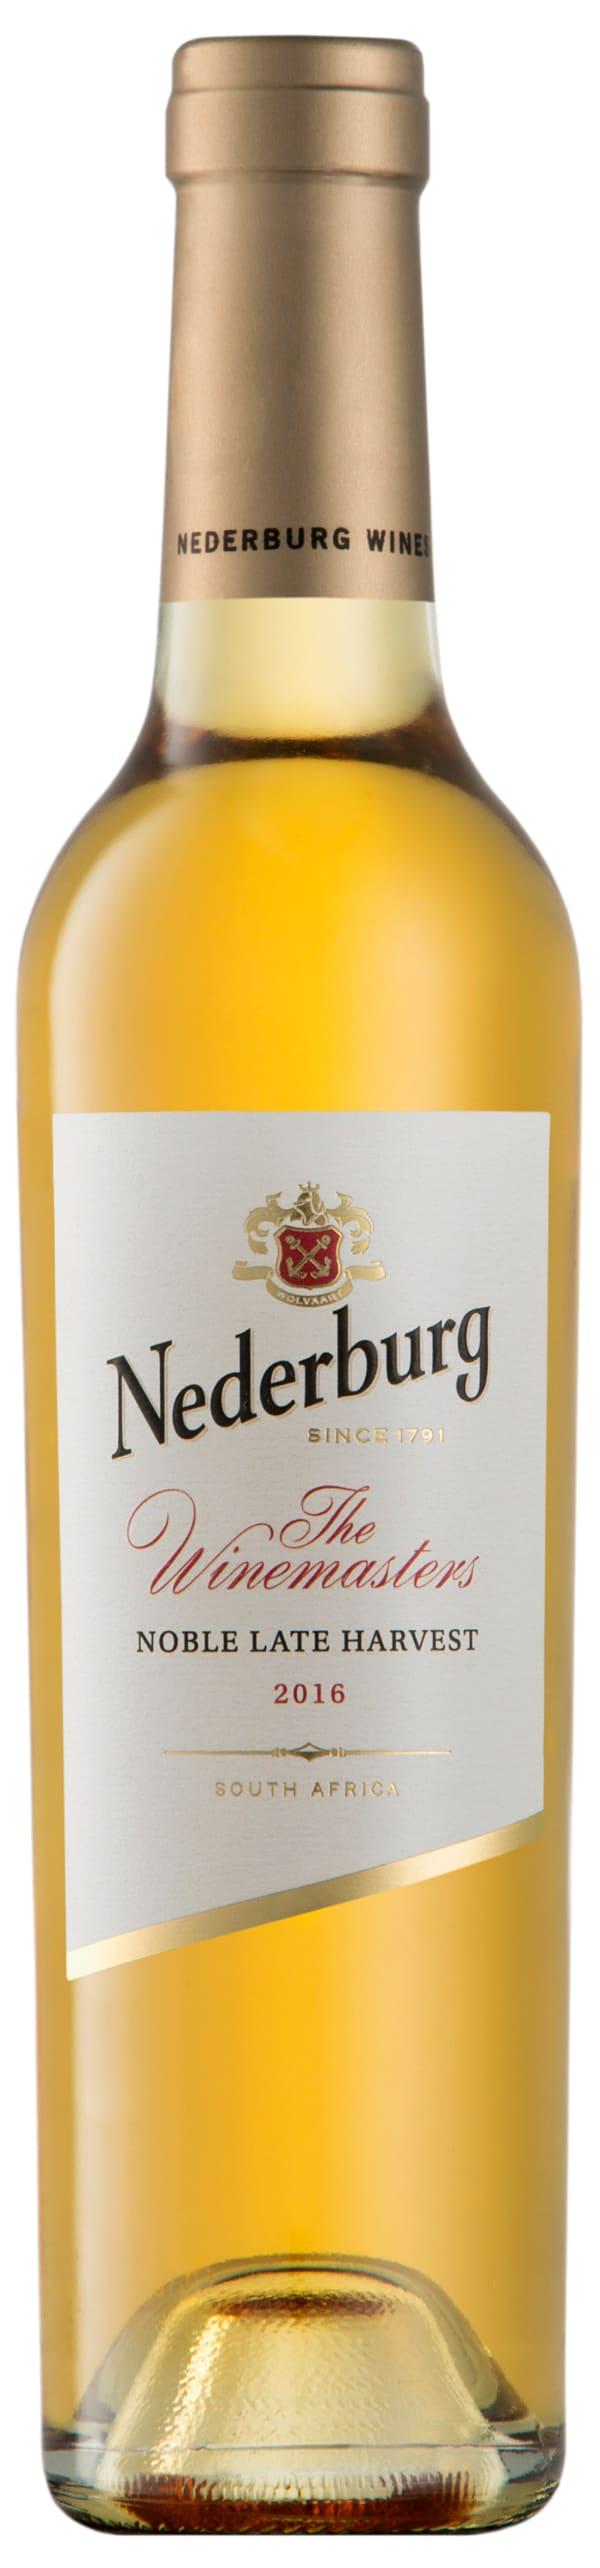 Nederburg The Winemasters Noble Late Harvest 2018